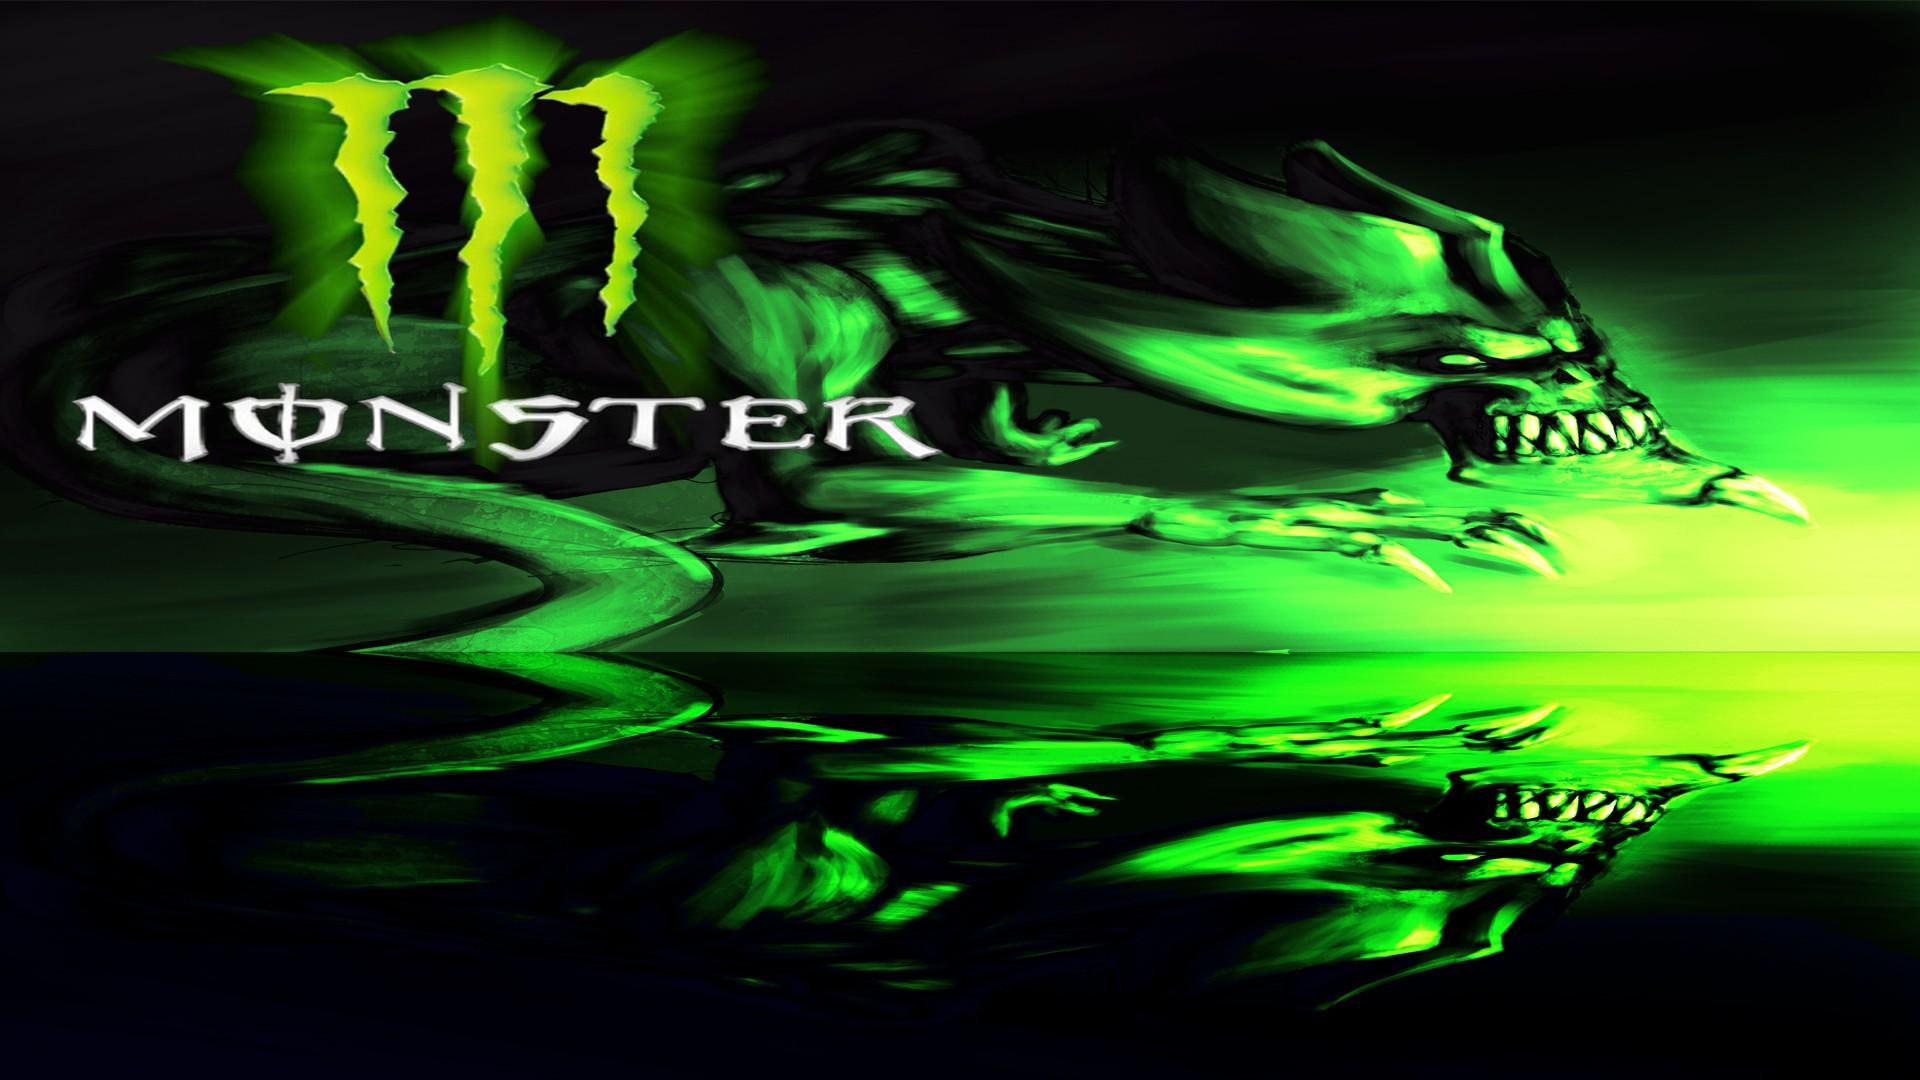 Monster Energy Wallpaper Hd Wallpaper 1920x1080